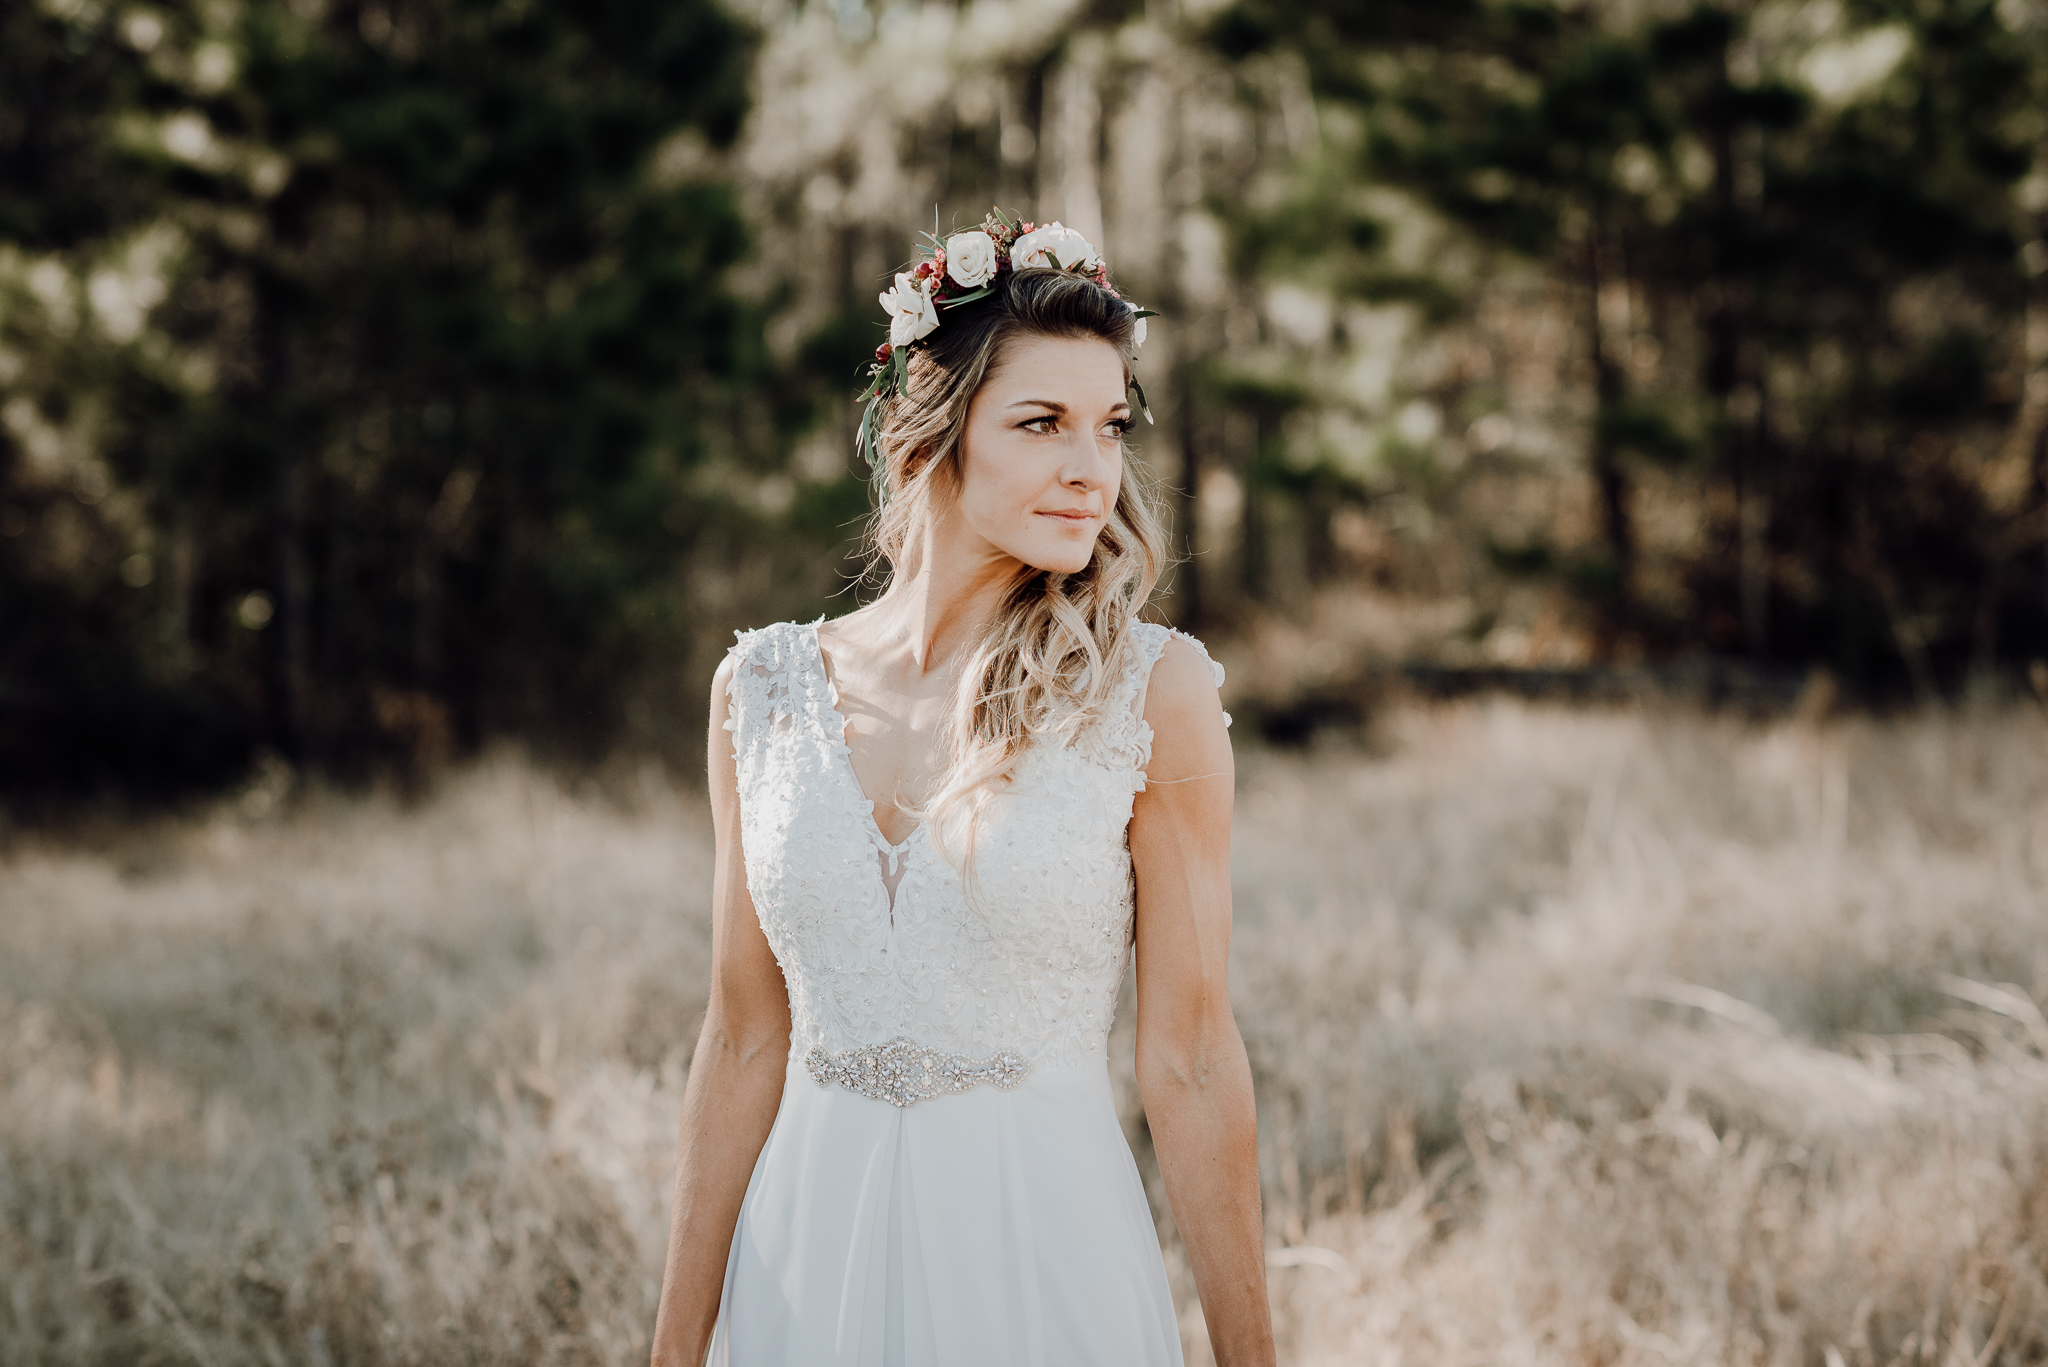 Michelle + Aron-Houston Wedding Photographer-Magnolia Meadows-Winter Wedding | Kristen Giles Photography - 023.jpg